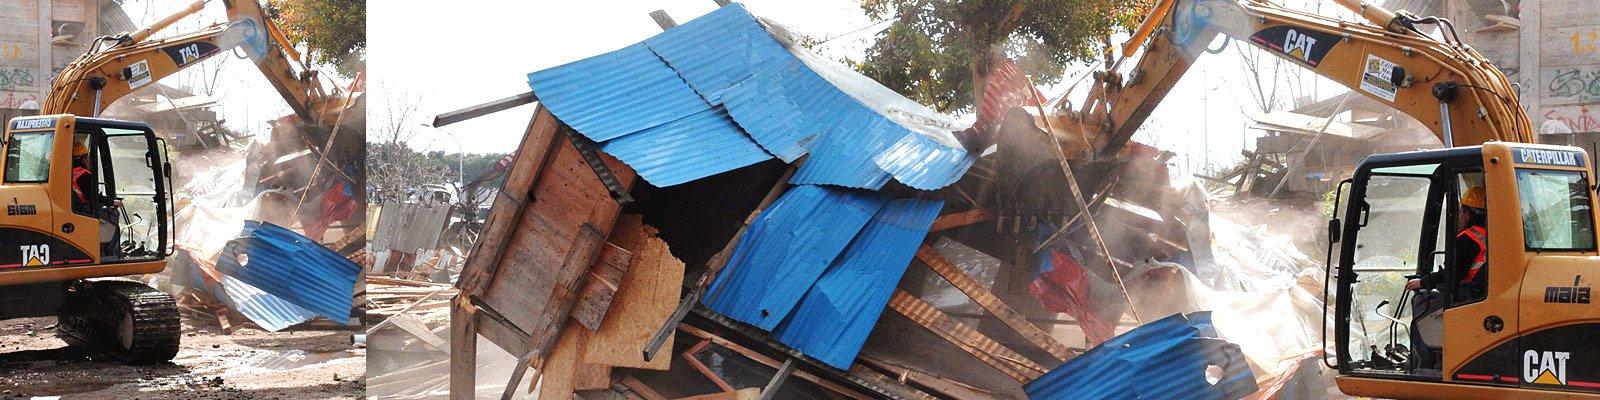 baracca rom abbattuta